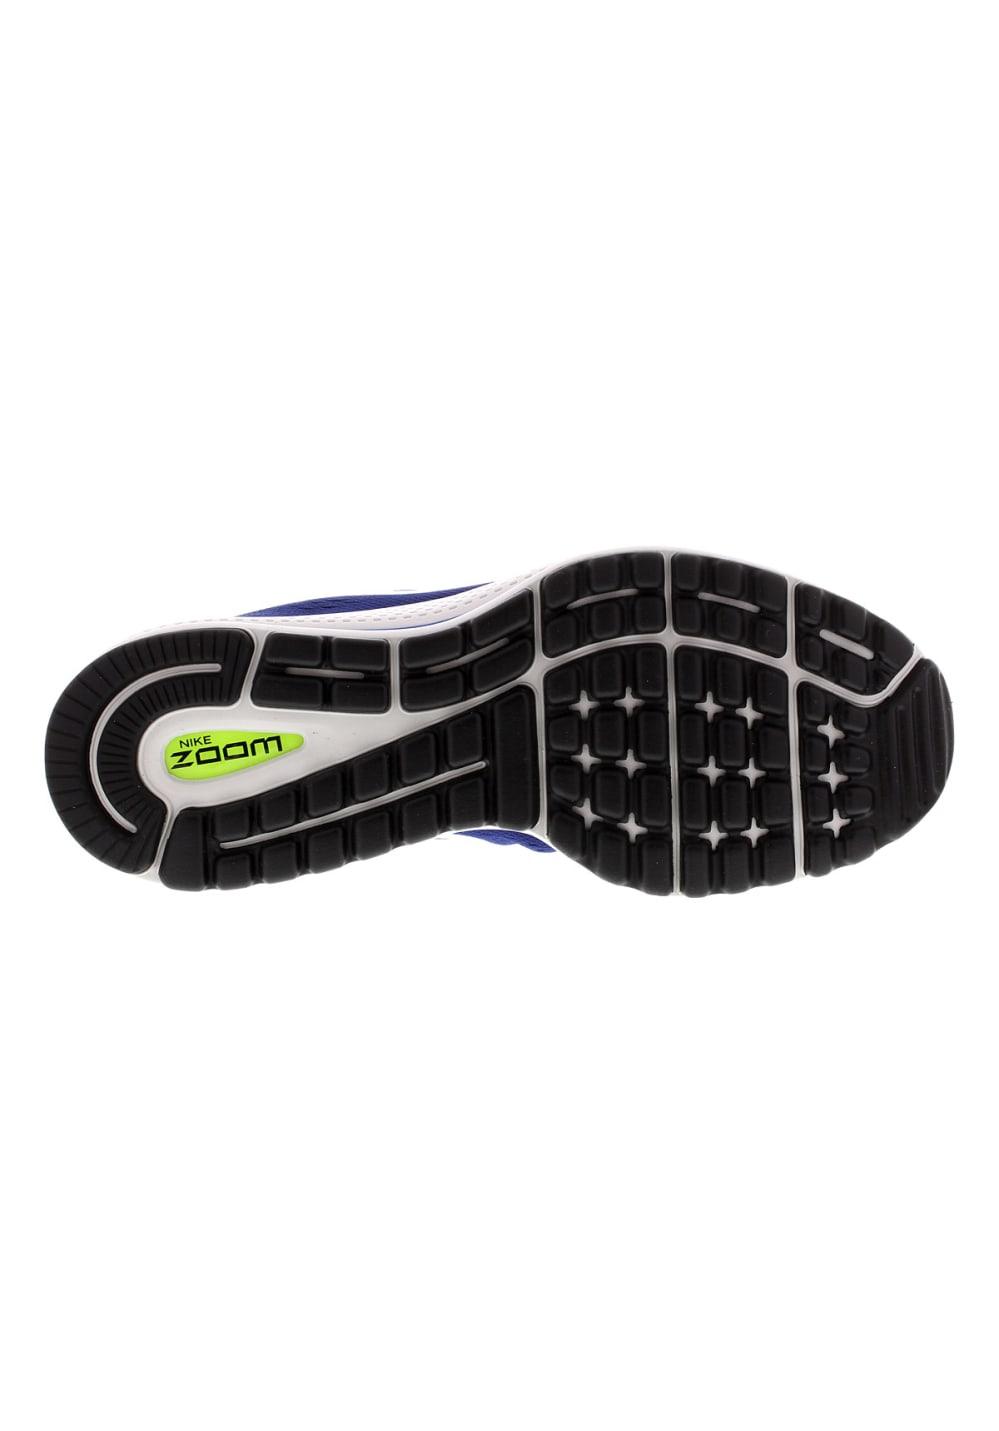 Nike Air Zoom Vomero 12 Zapatillas de running para Hombre Azul